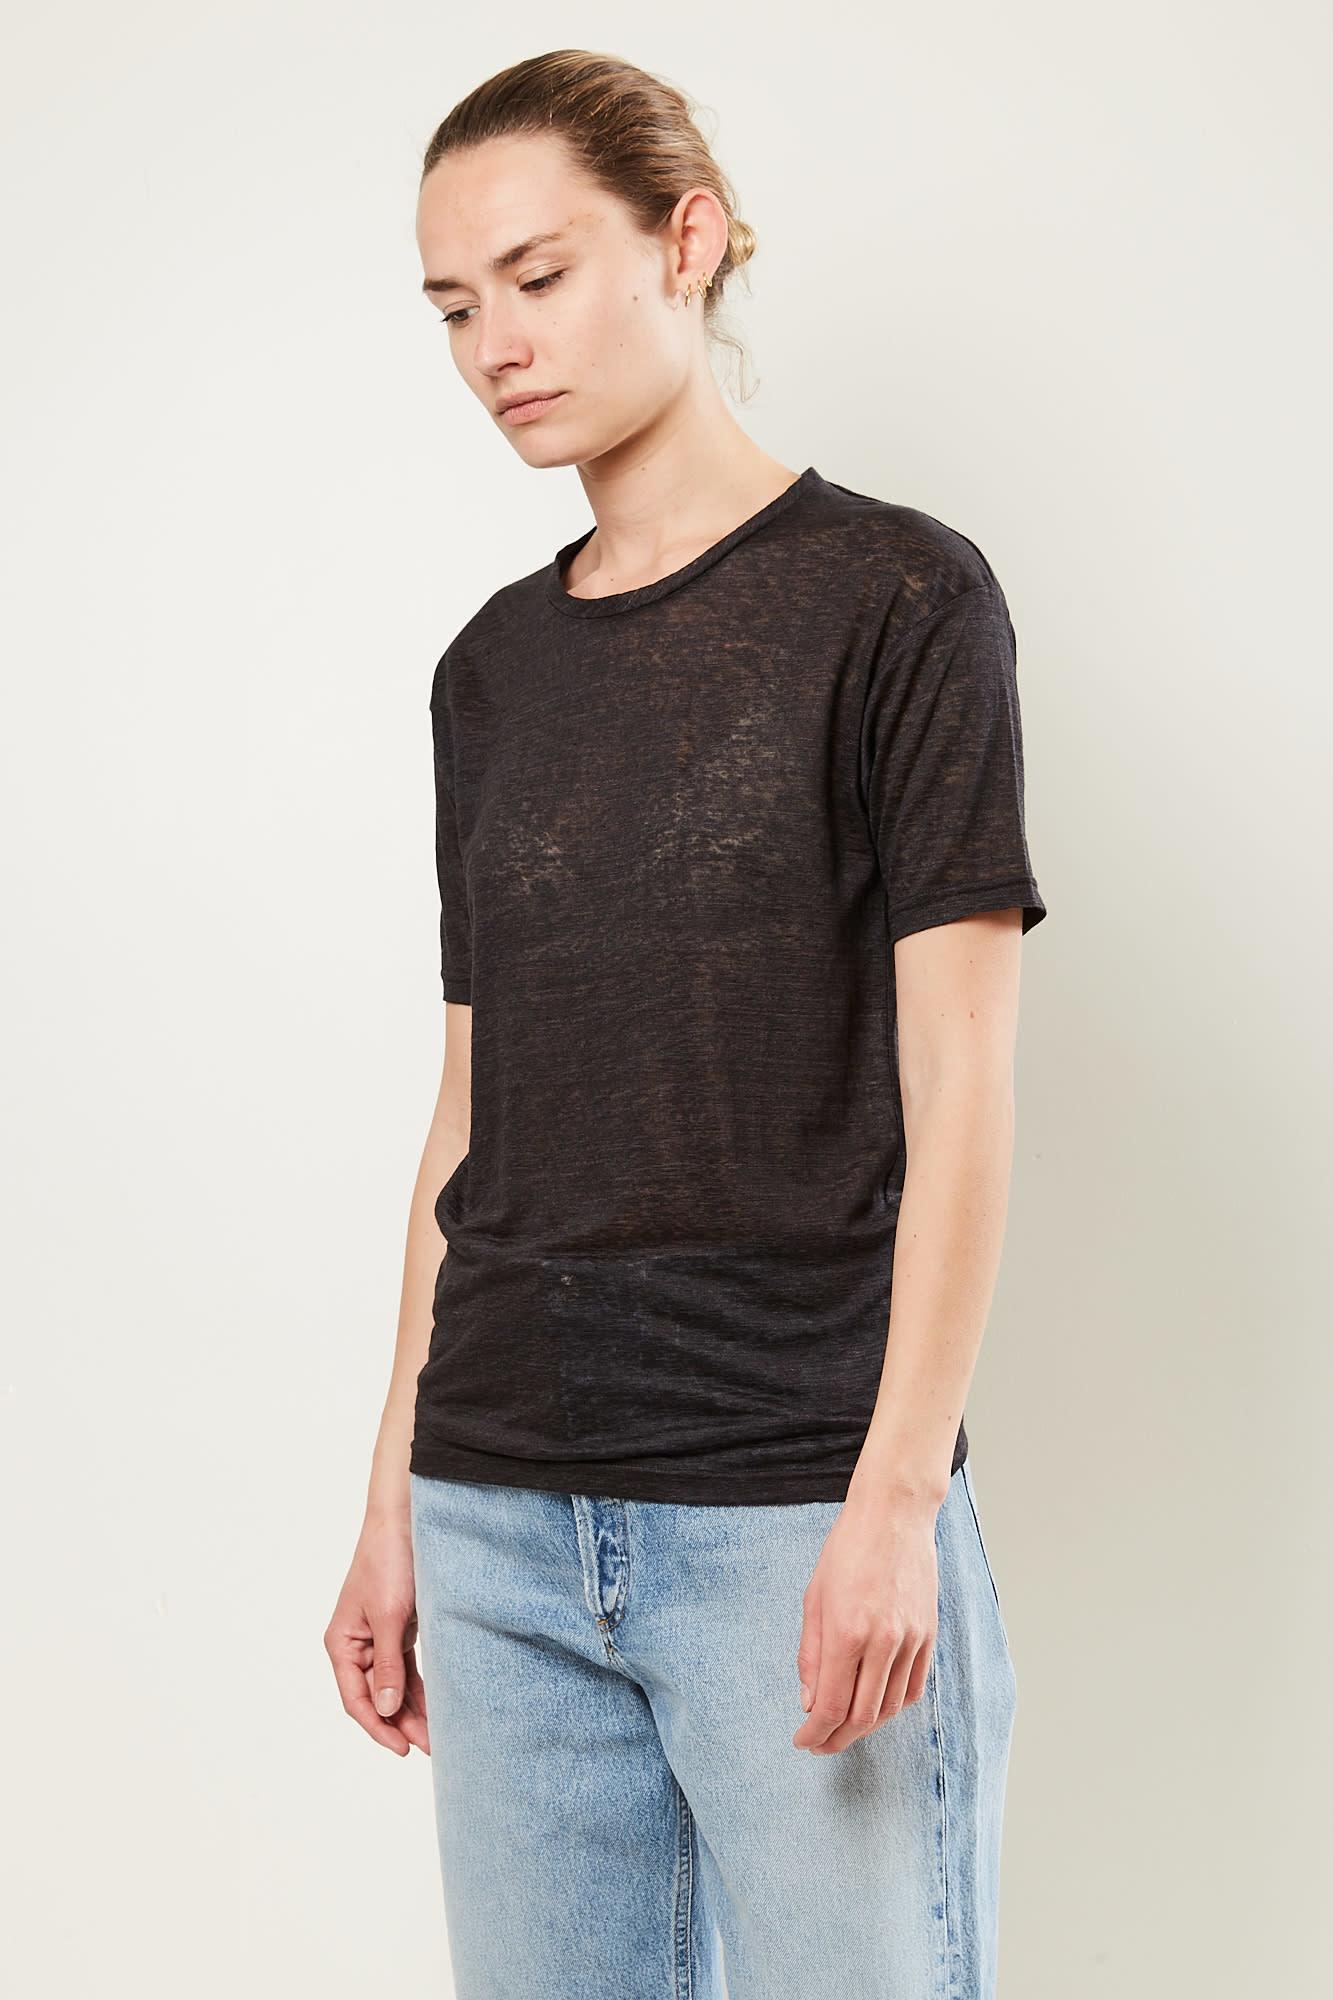 Isabel Marant - madjo tee shirt black